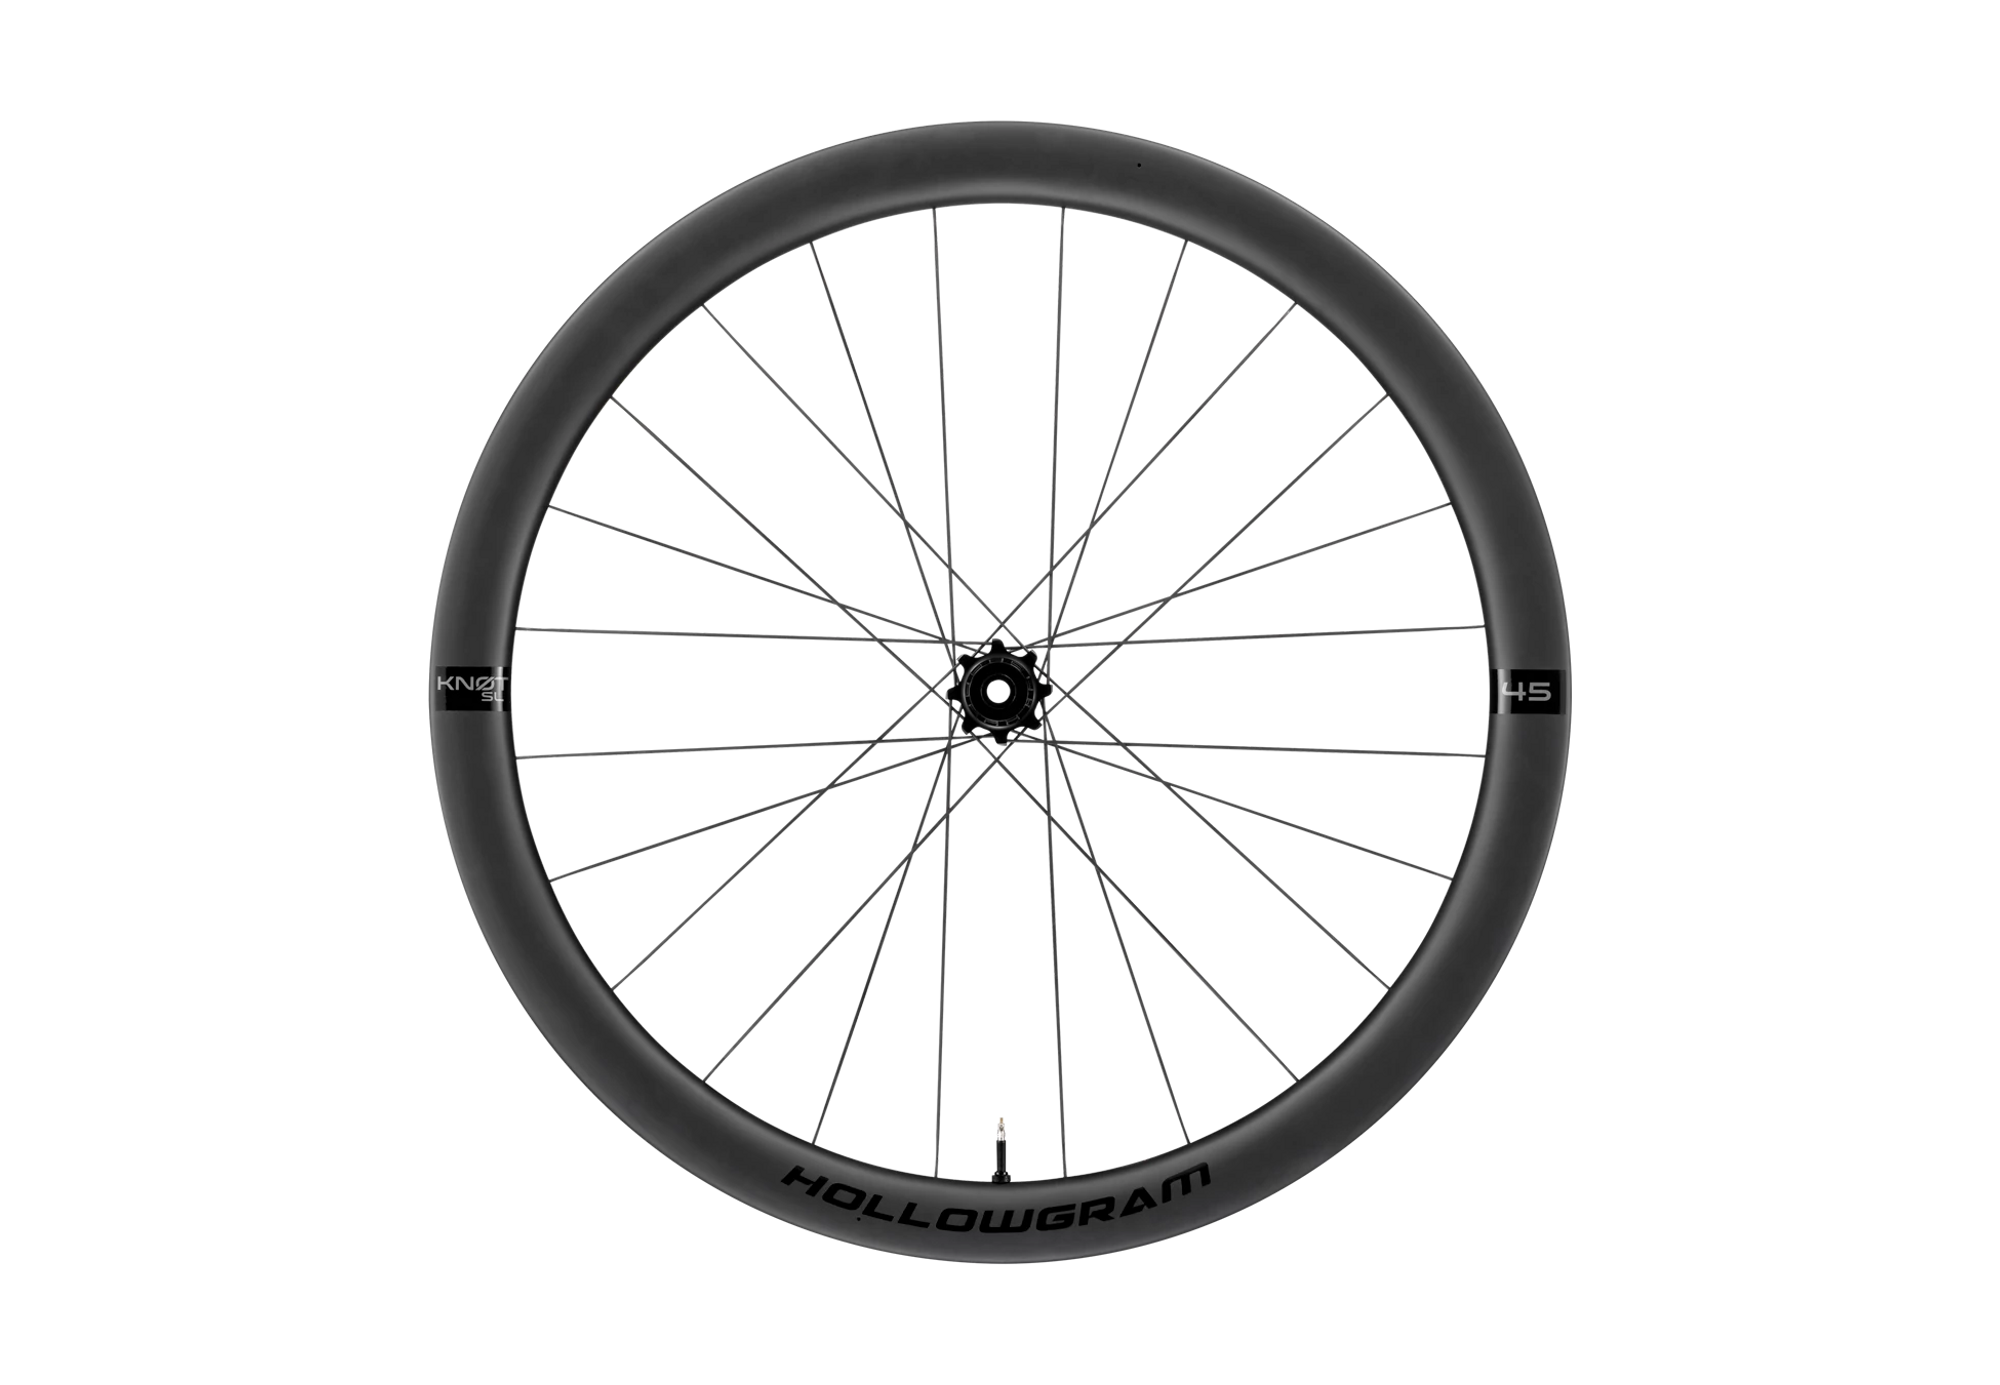 HollowGram 45 SL KNØT Wheel 142x12 Shimano Detail Image